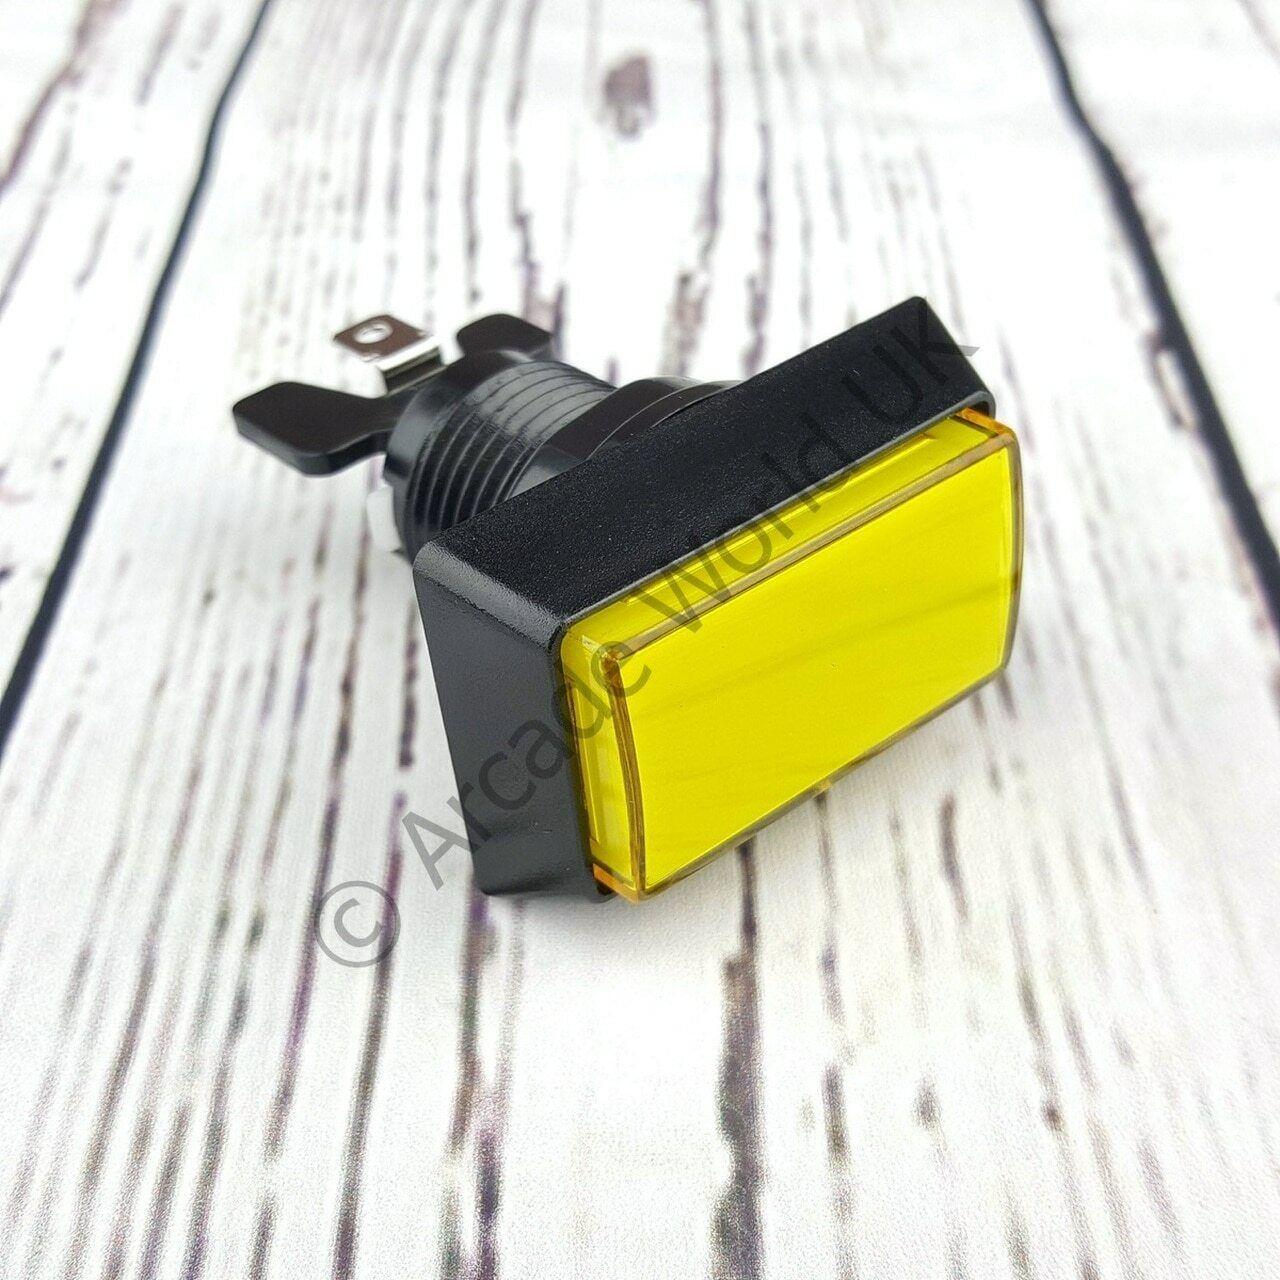 High Profile Rectangular Illuminated Arcade Button - 12V LED & 4.8mm Microswitch